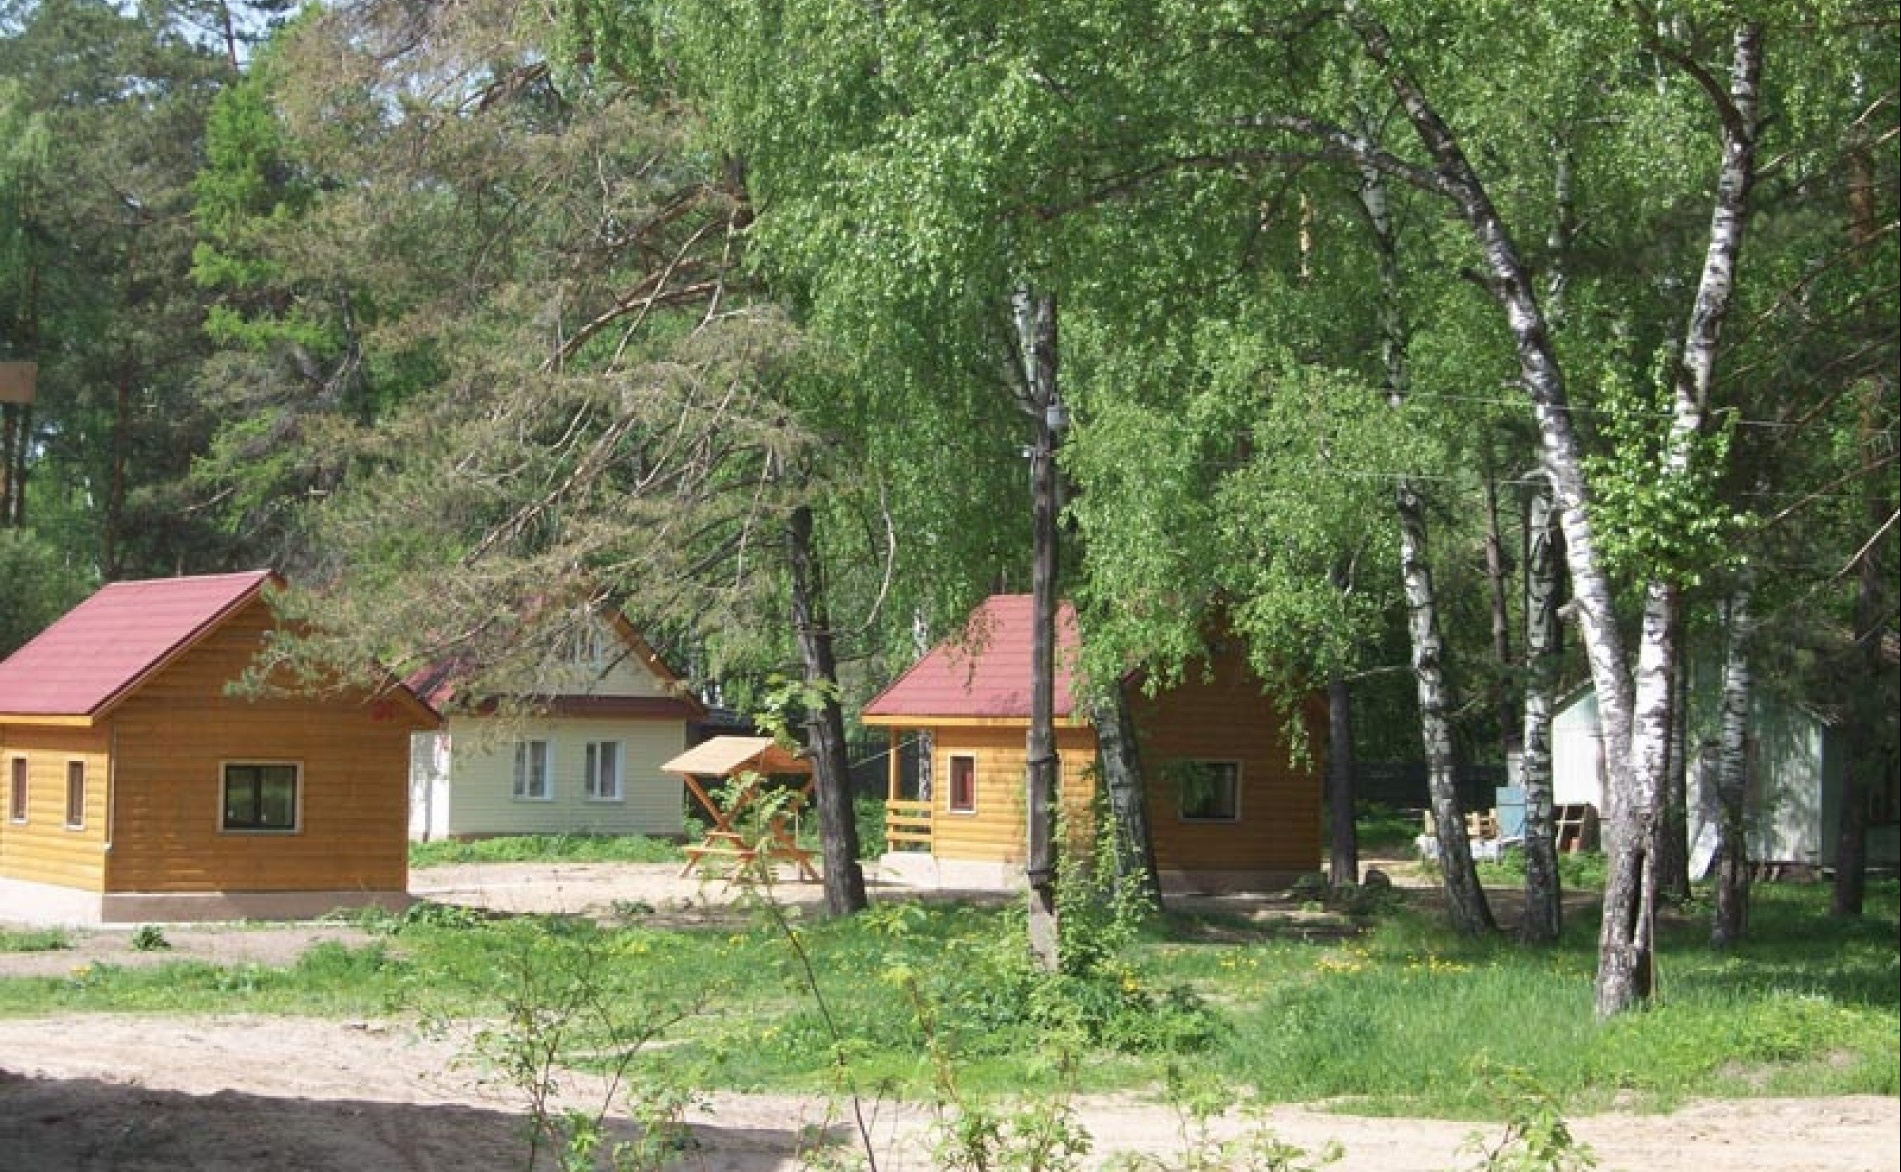 База отдыха «Лебяжье» Республика Татарстан, фото 4